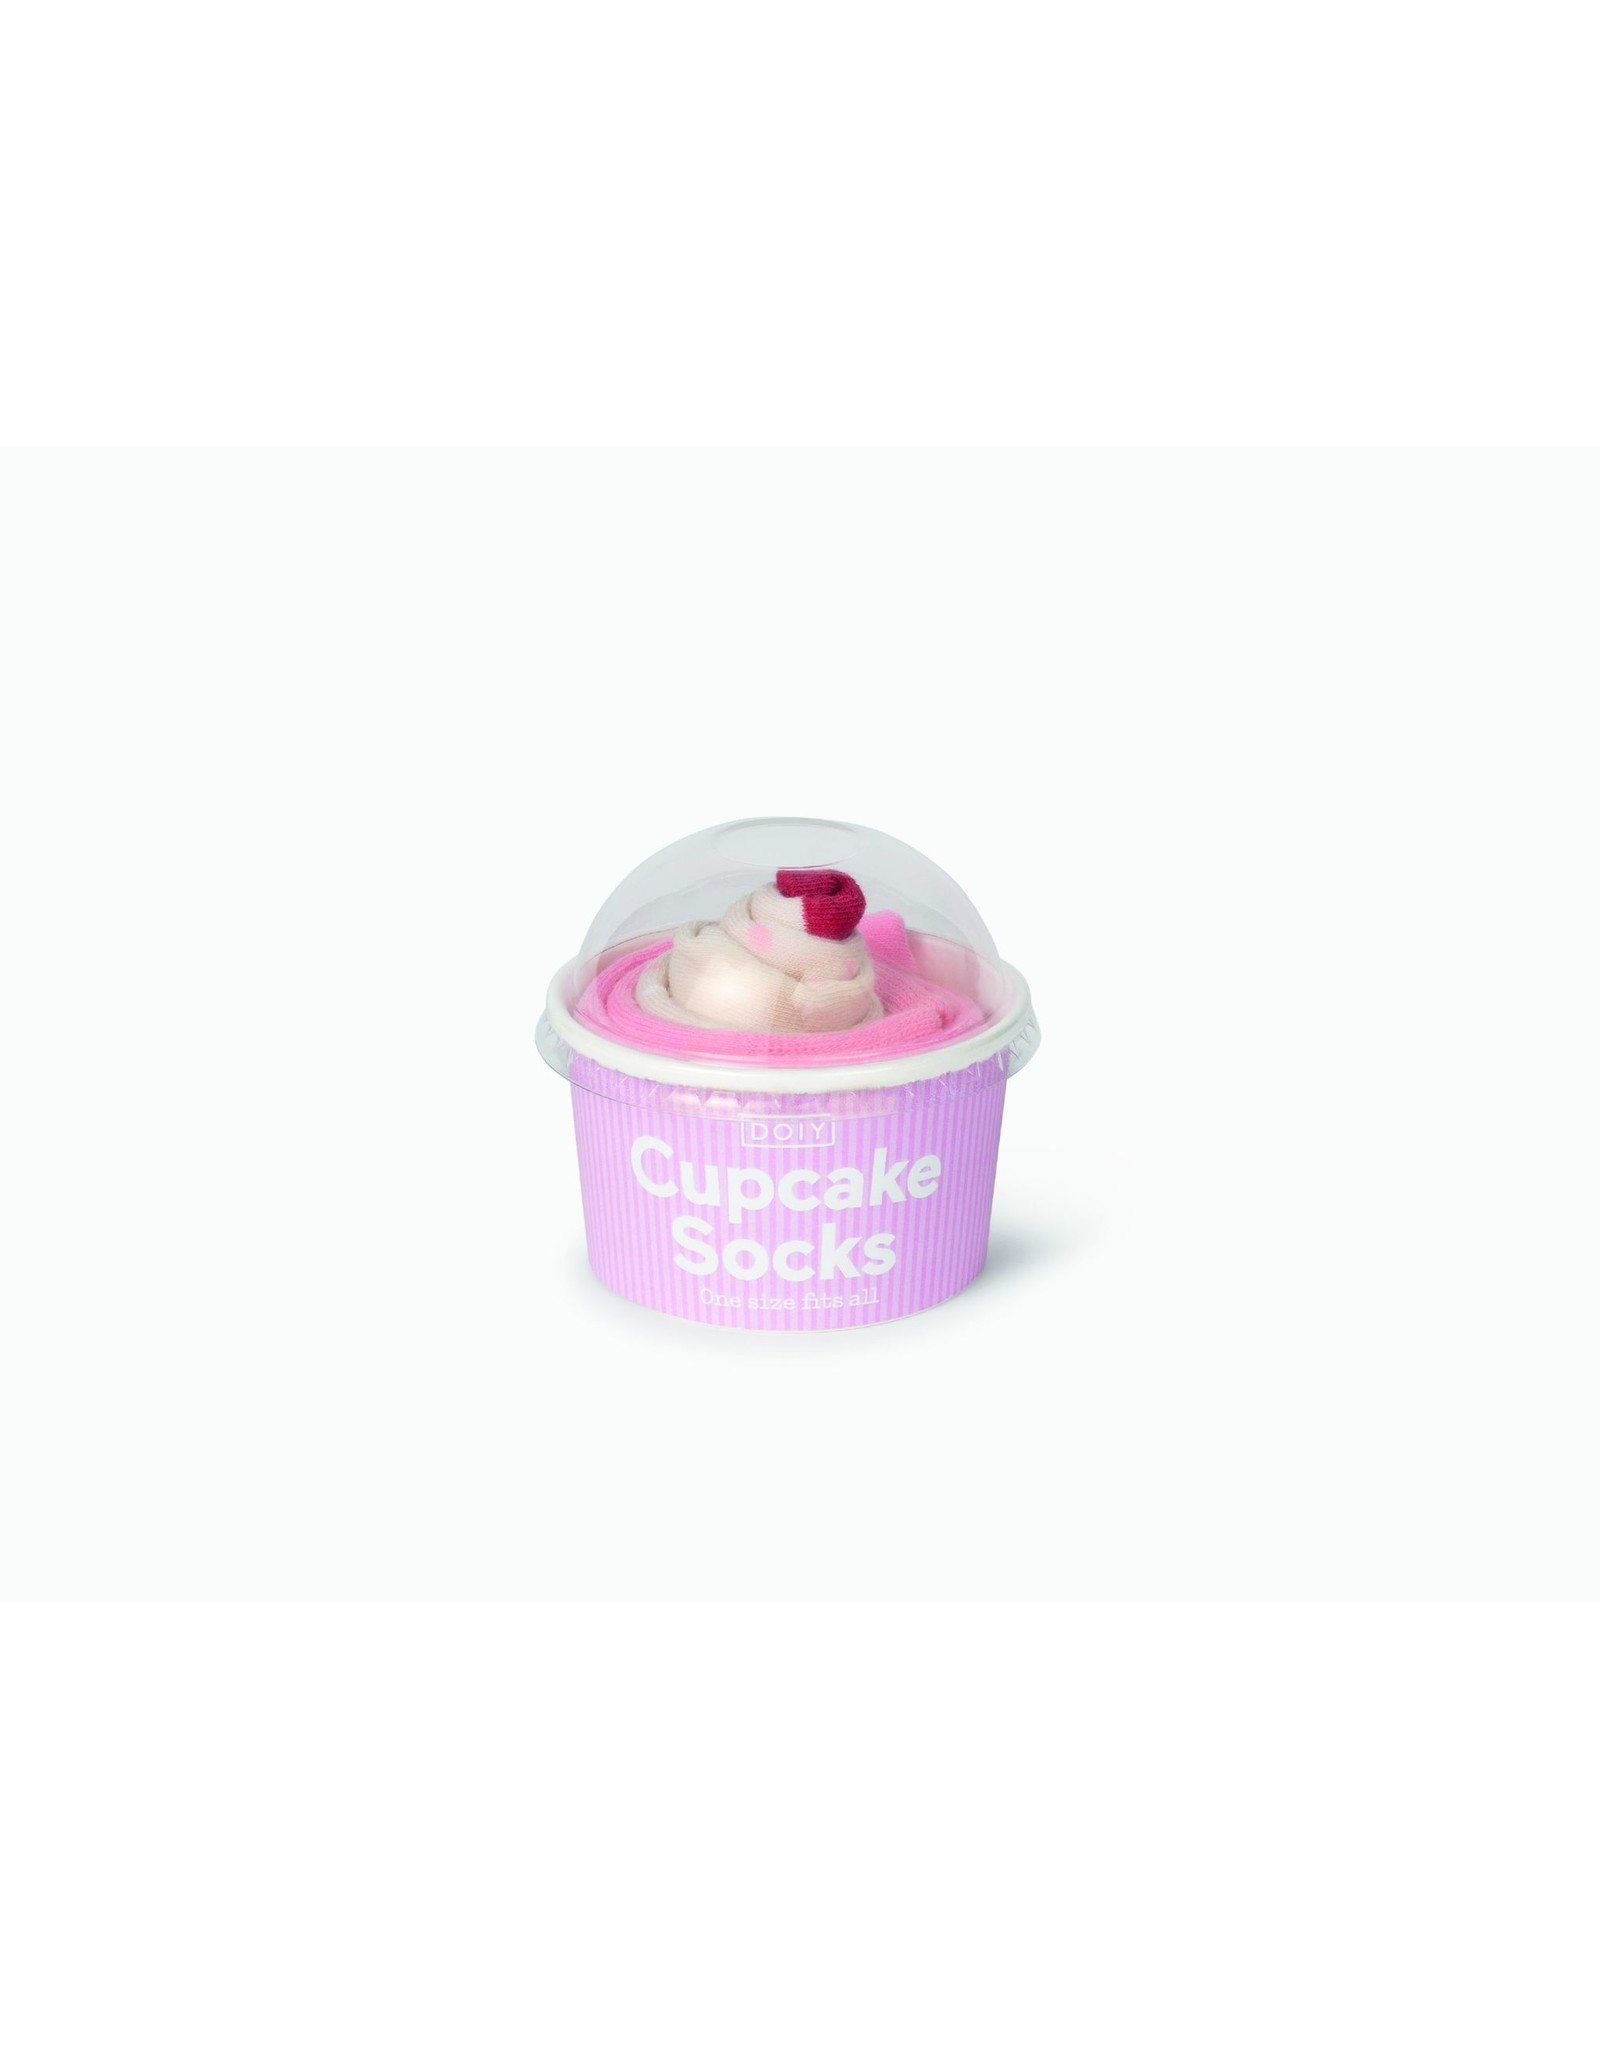 socks - cupcake strawberry (6)